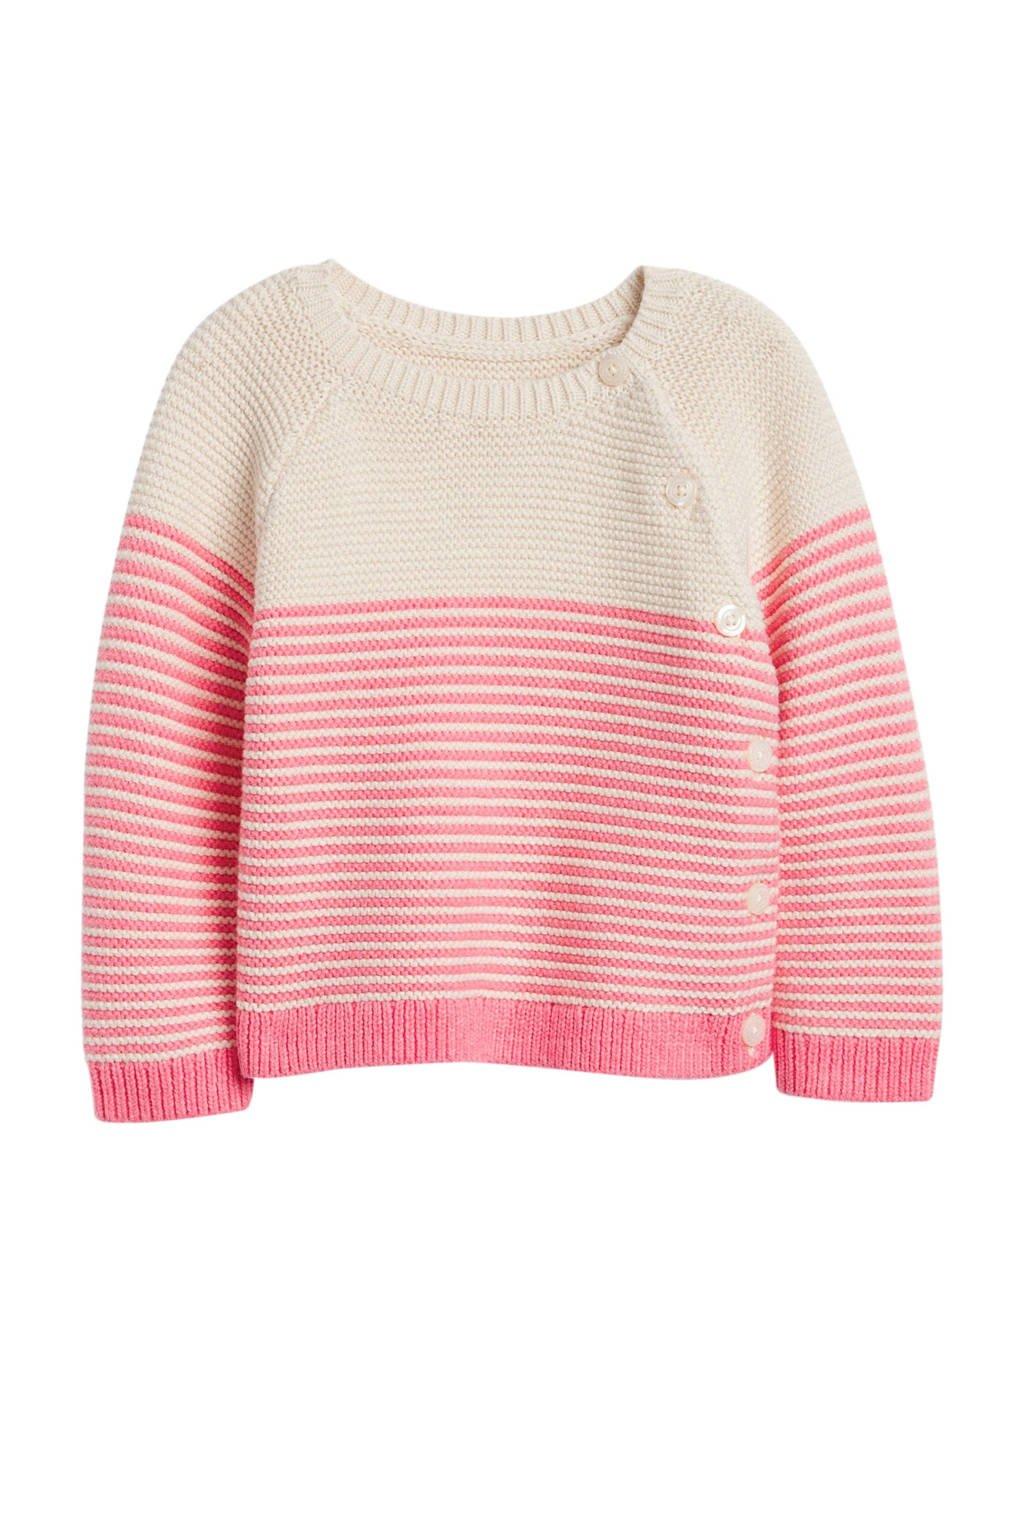 GAP baby gestreepte trui roze/ecru, Roze/ecru